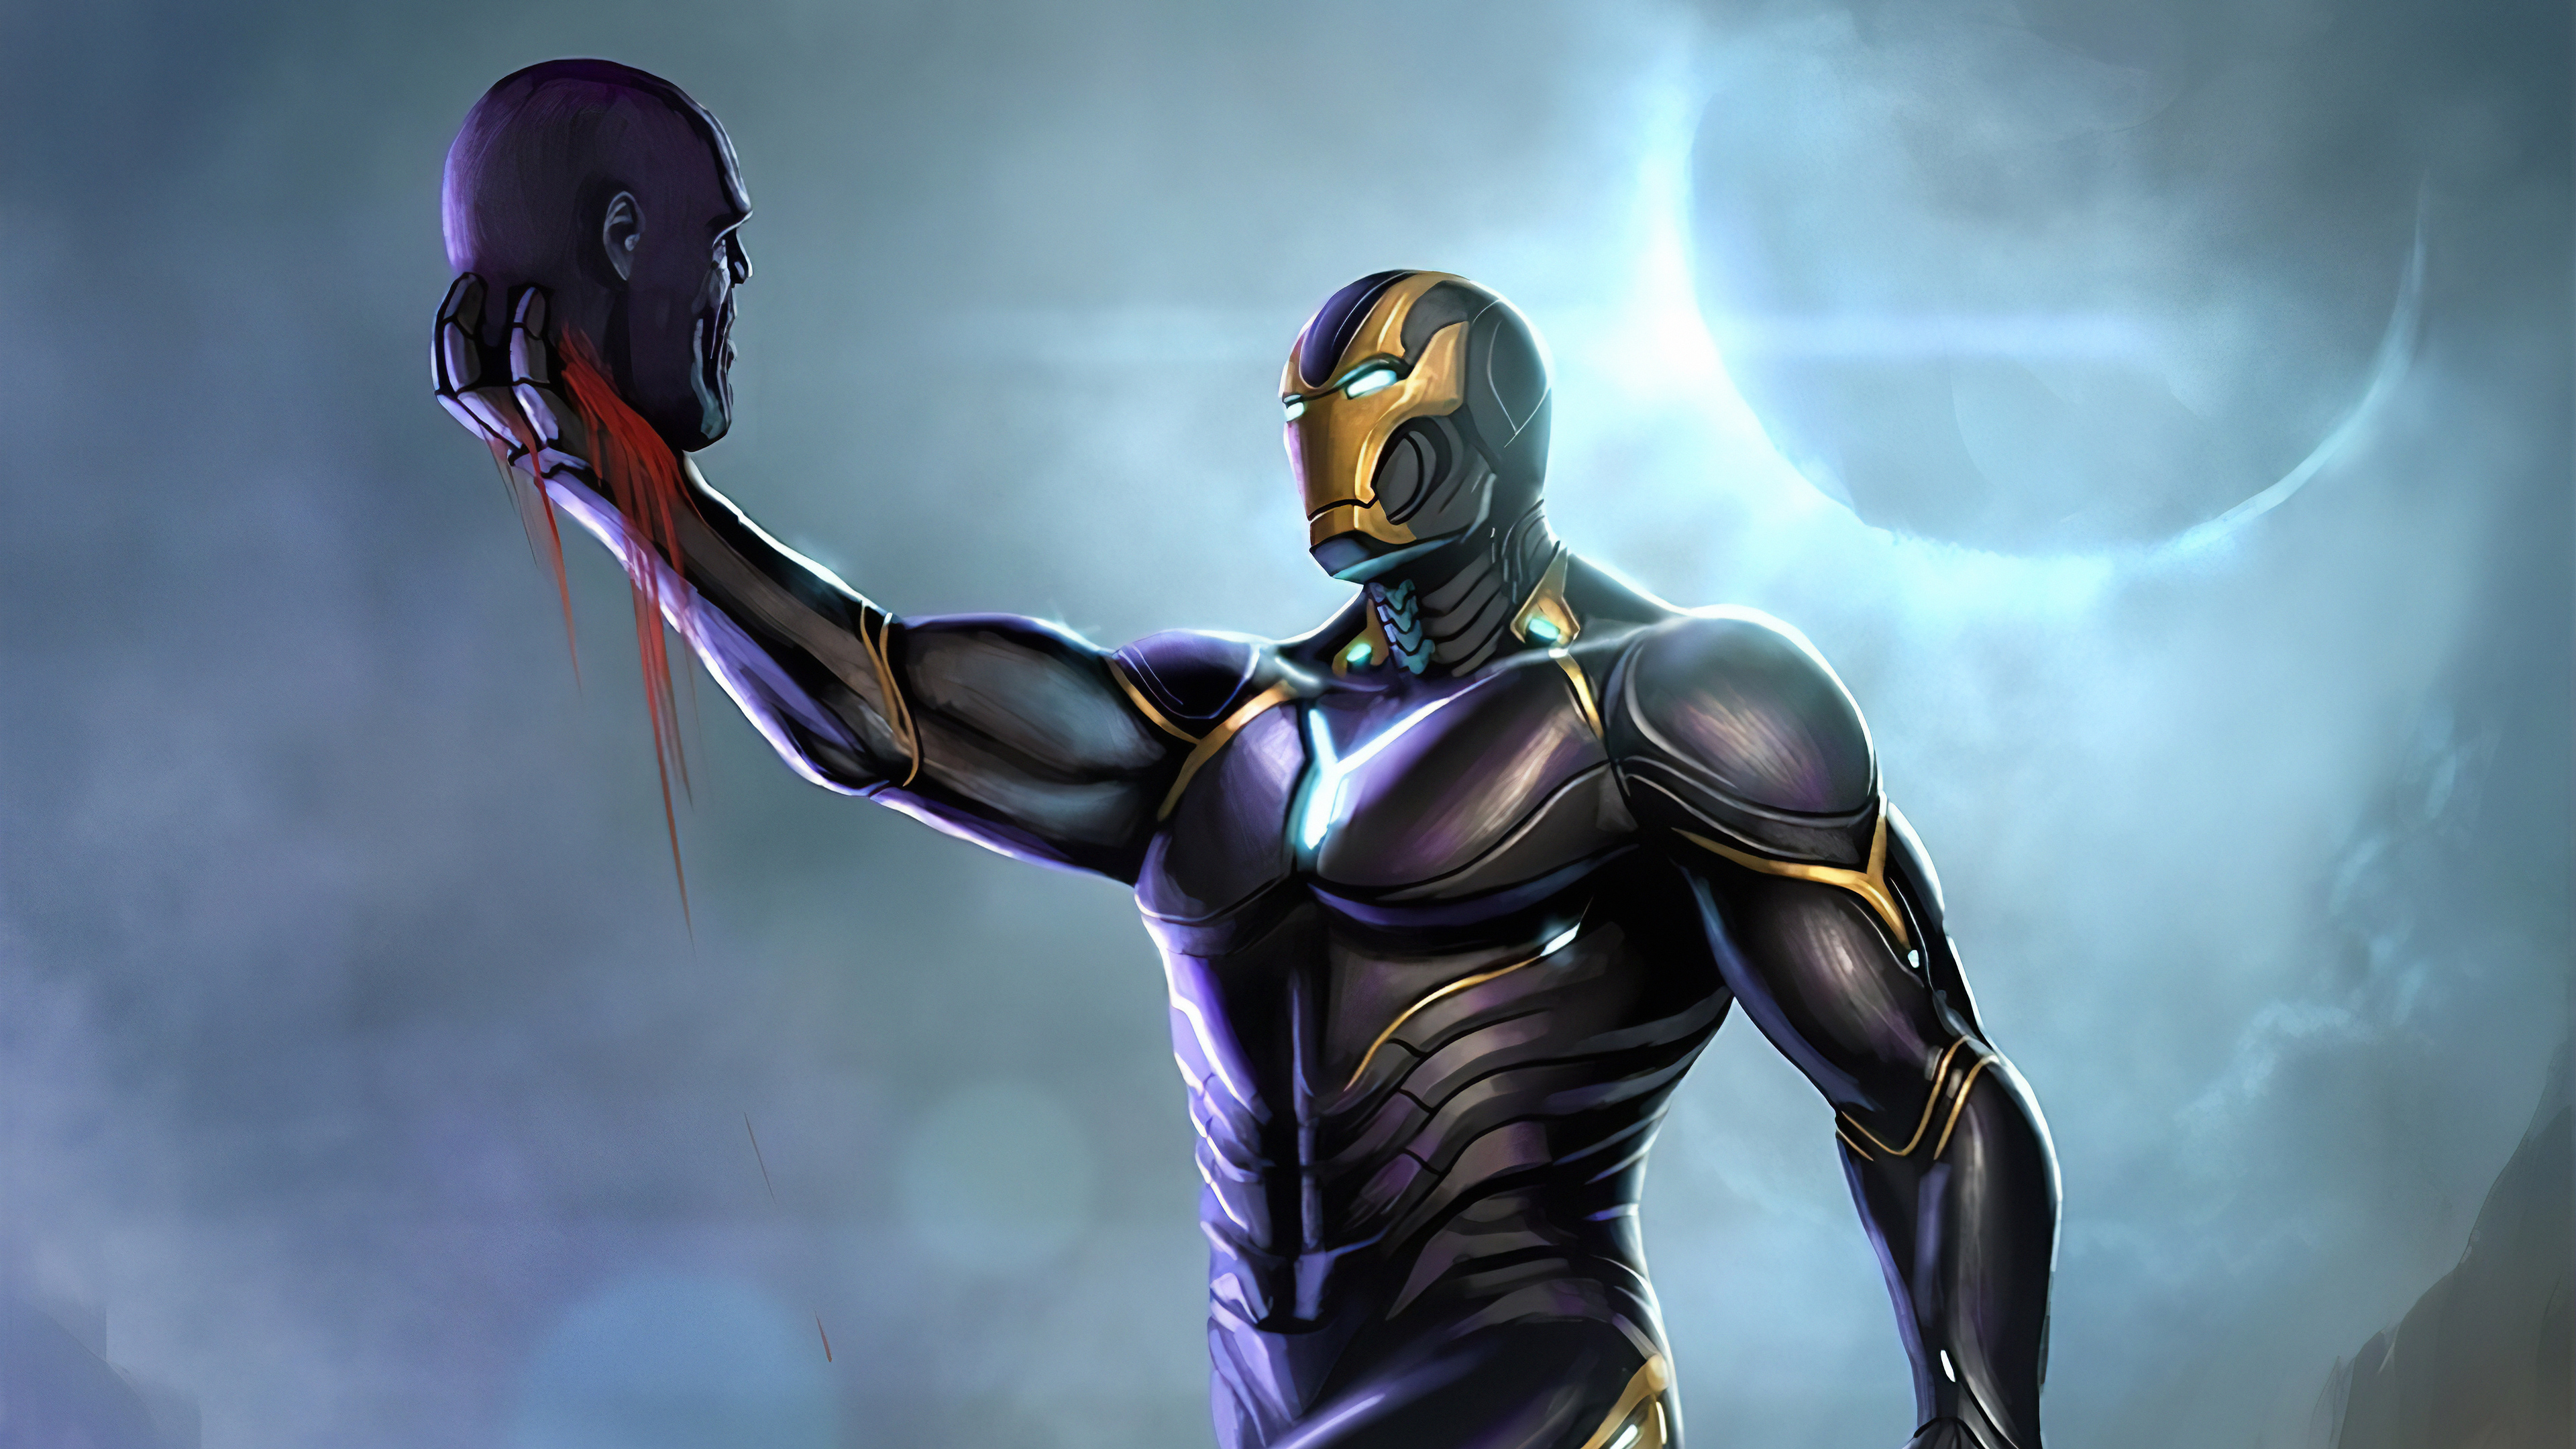 iron man thanos head 1572368612 - Iron Man Thanos Head - superheroes wallpapers, iron man wallpapers, hd-wallpapers, digital art wallpapers, artwork wallpapers, 4k-wallpapers